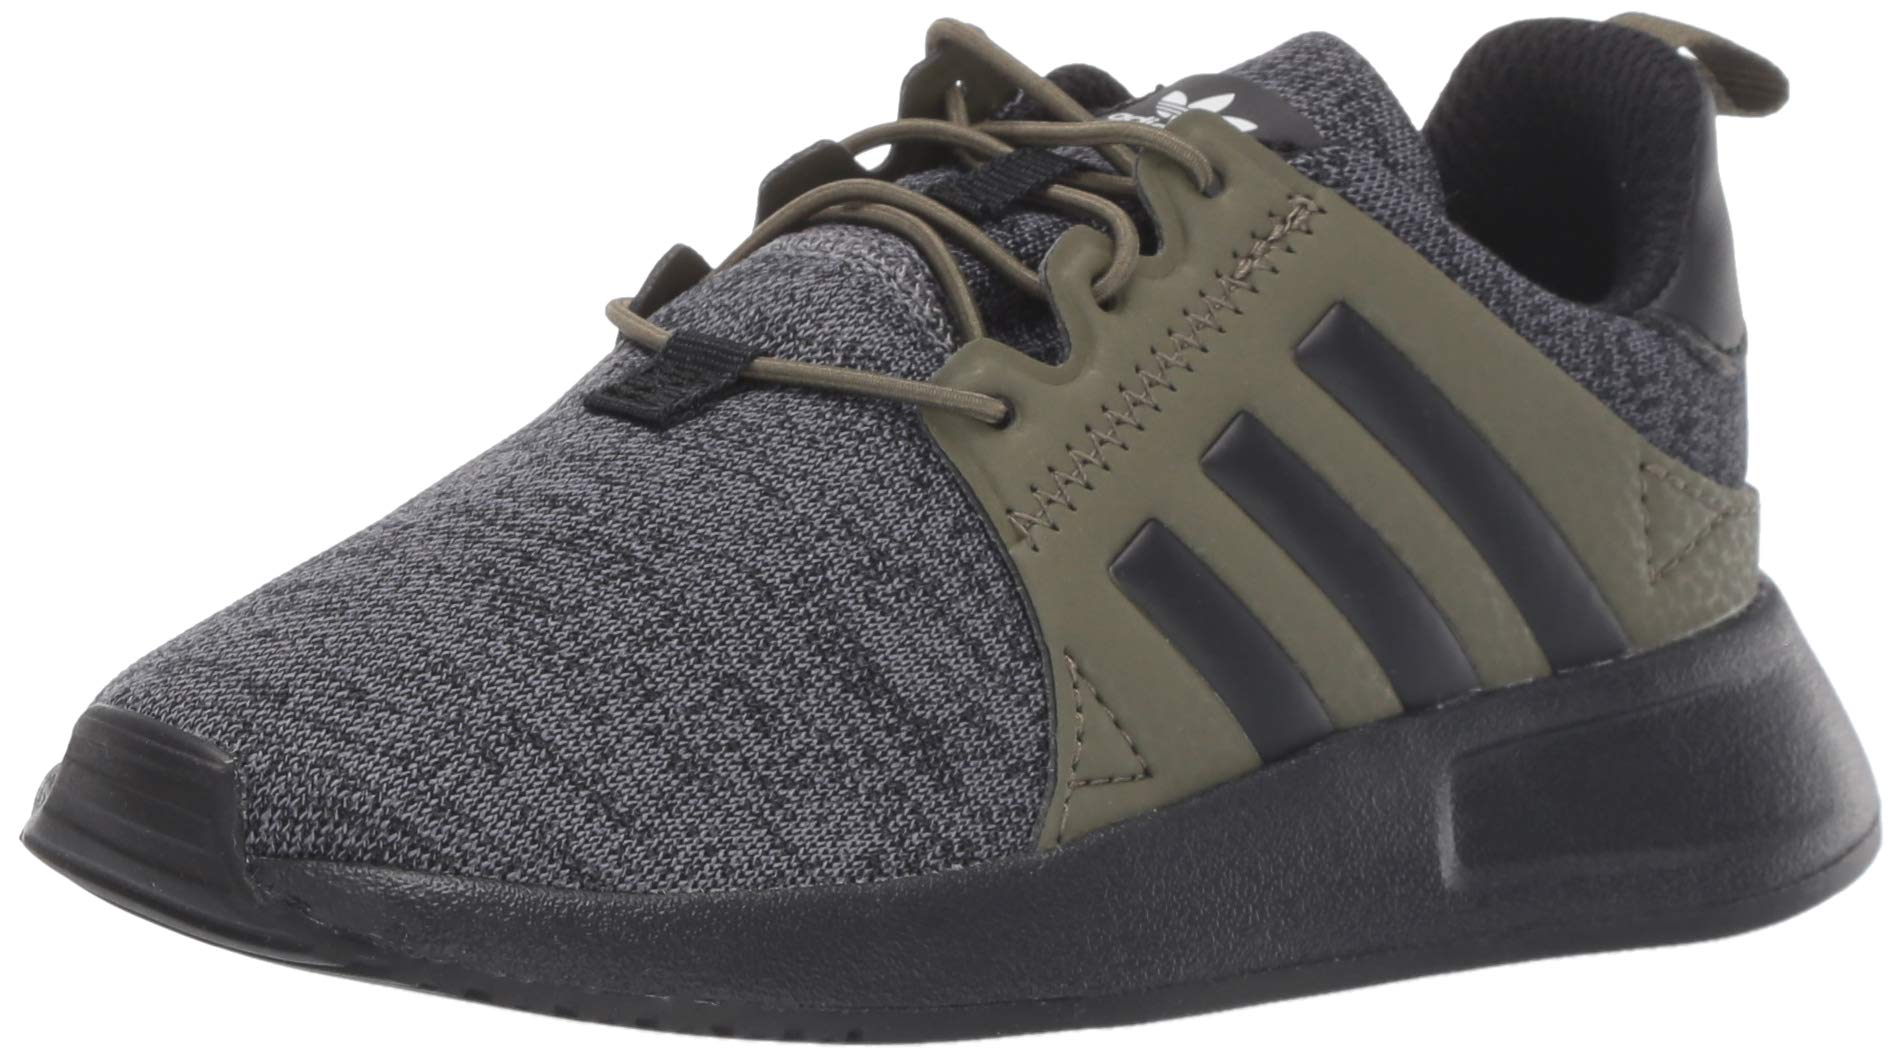 adidas Originals Baby X_PLR Running Shoe, Dark Grey Heather/Black/raw Khaki, 4K M US Toddler